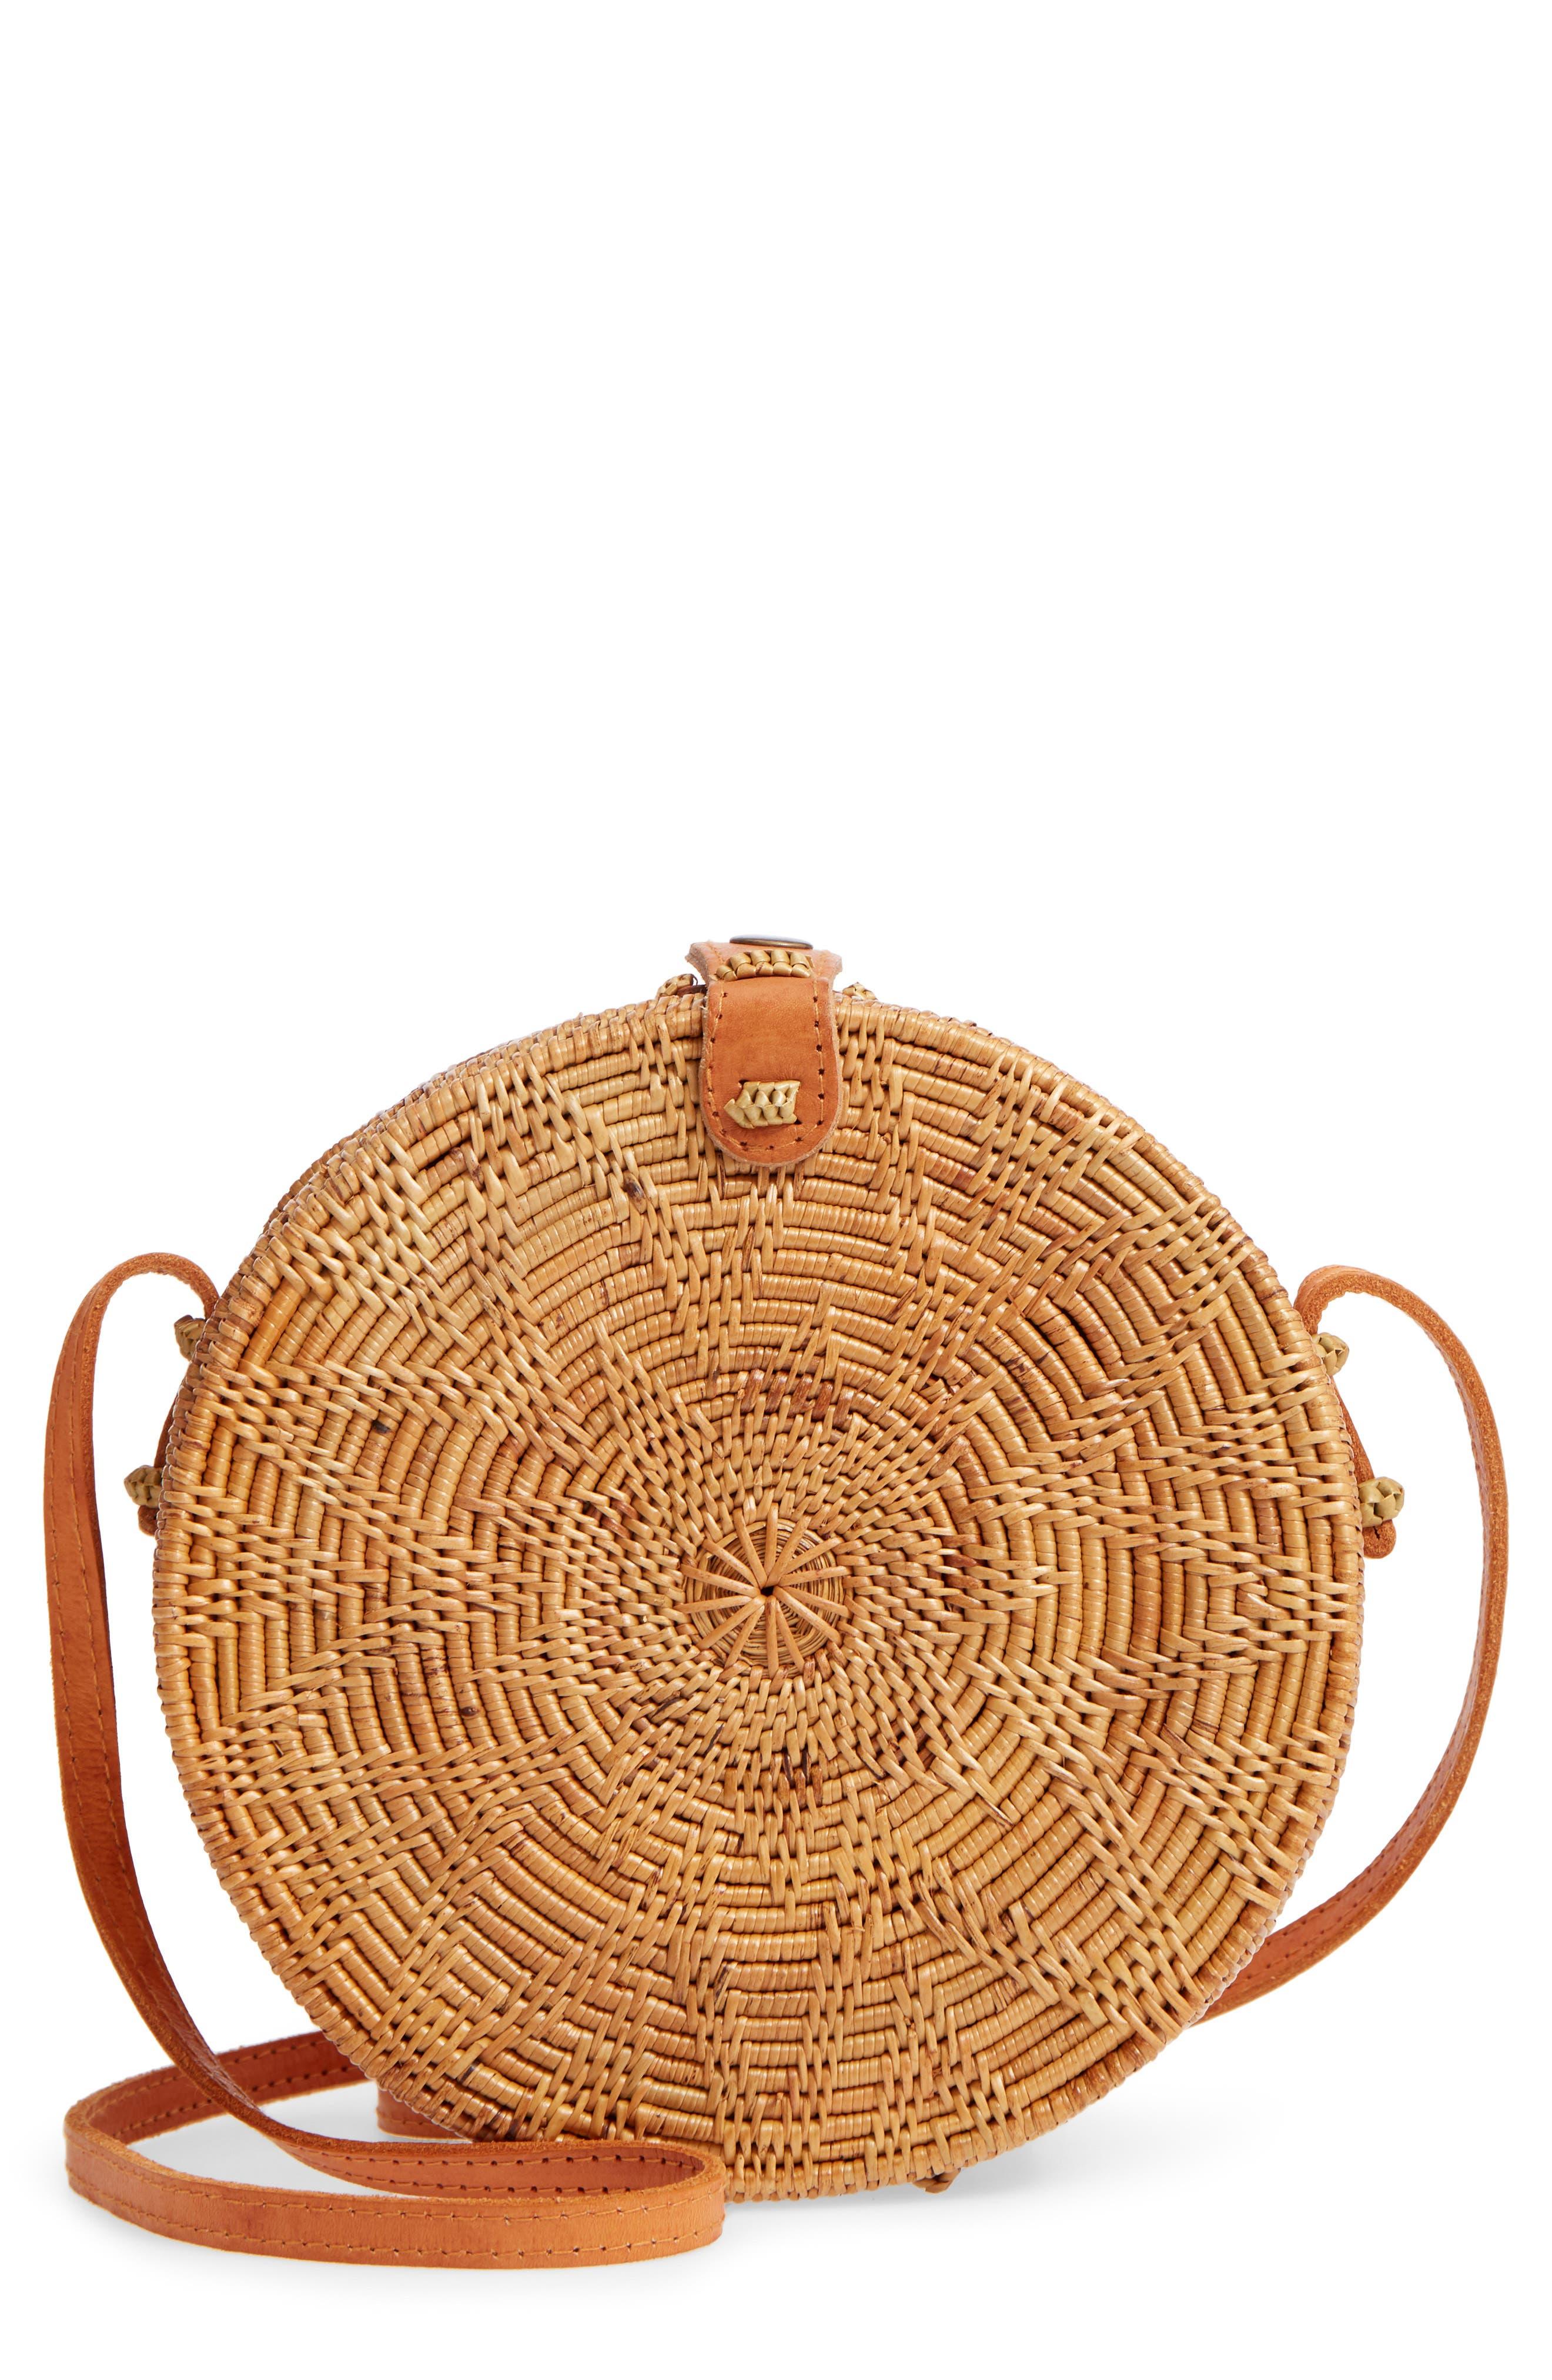 Woven Rattan Circle Basket Crossbody,                             Main thumbnail 1, color,                             200